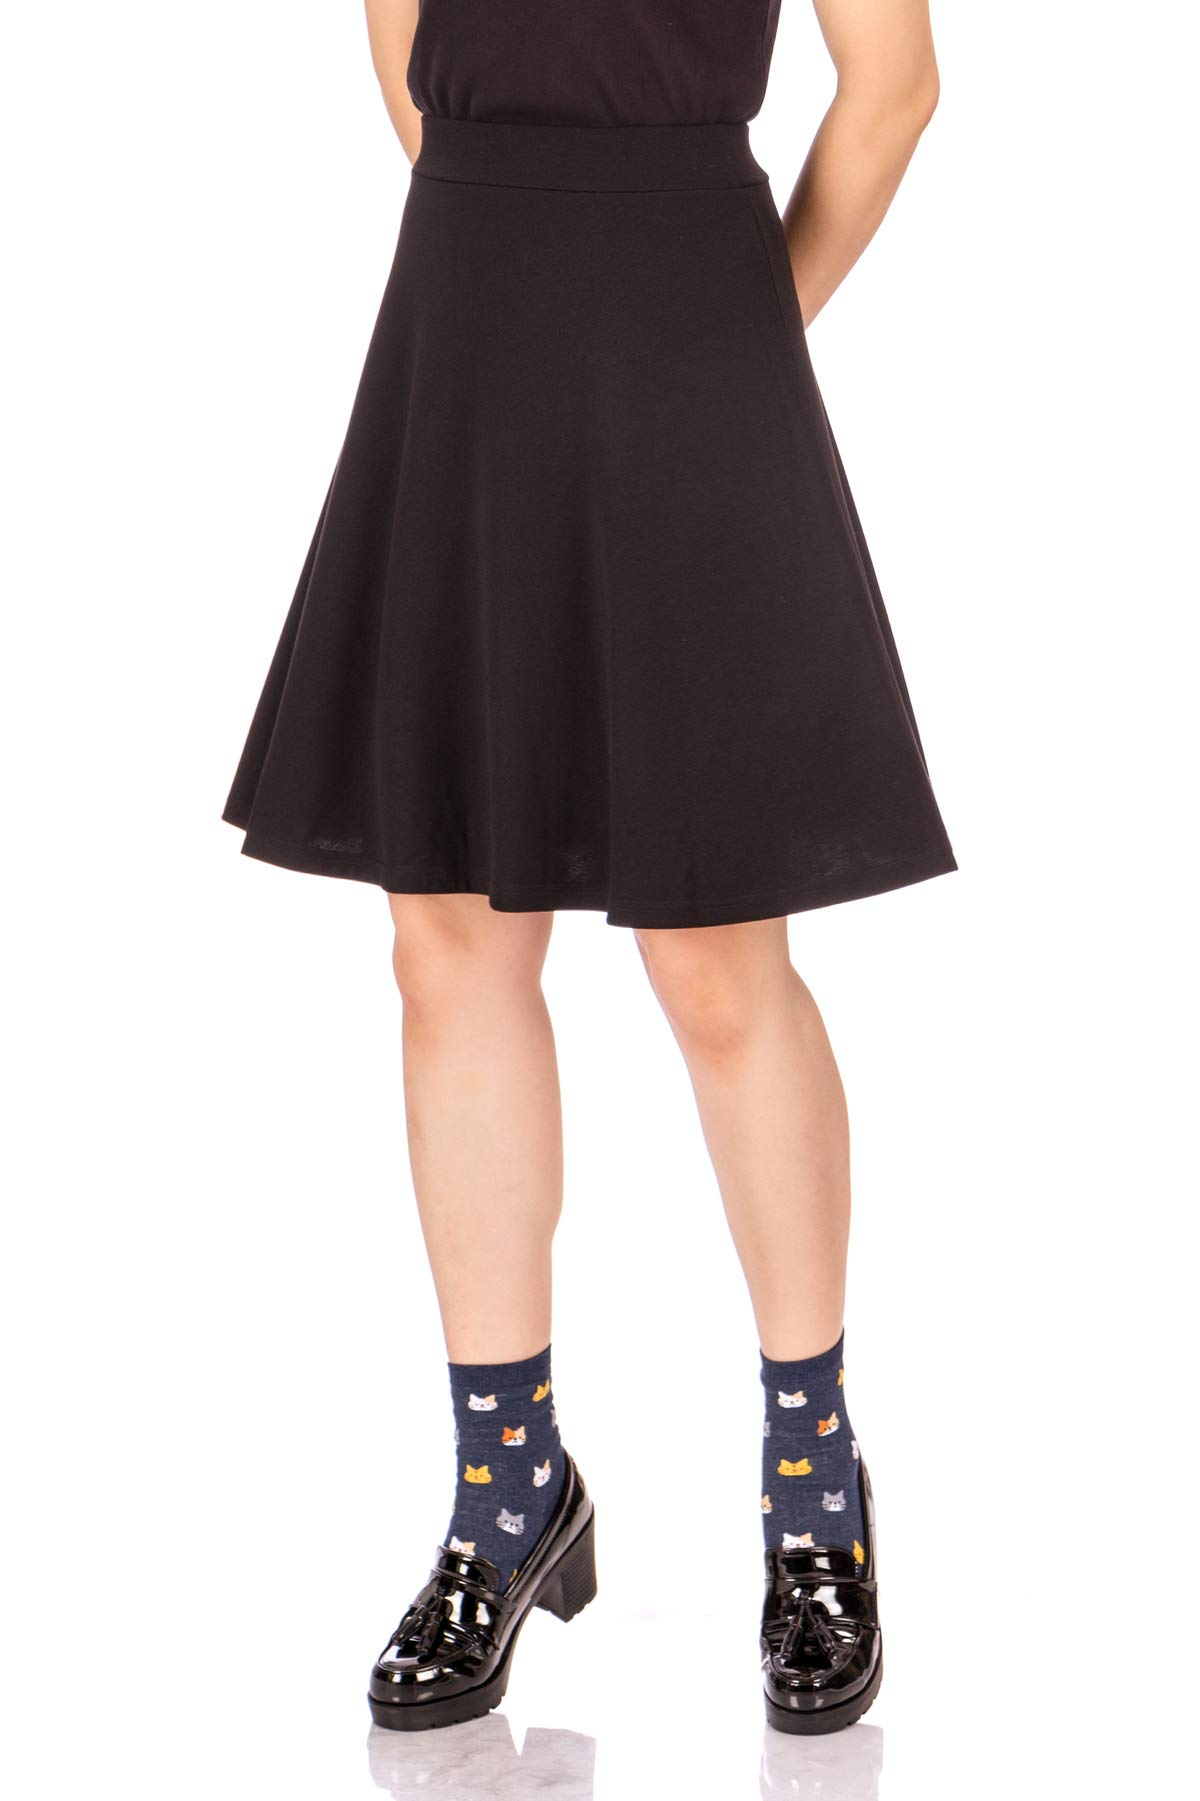 Dani's Choice Simple Stretch A-line Flared Knee Length Skirt